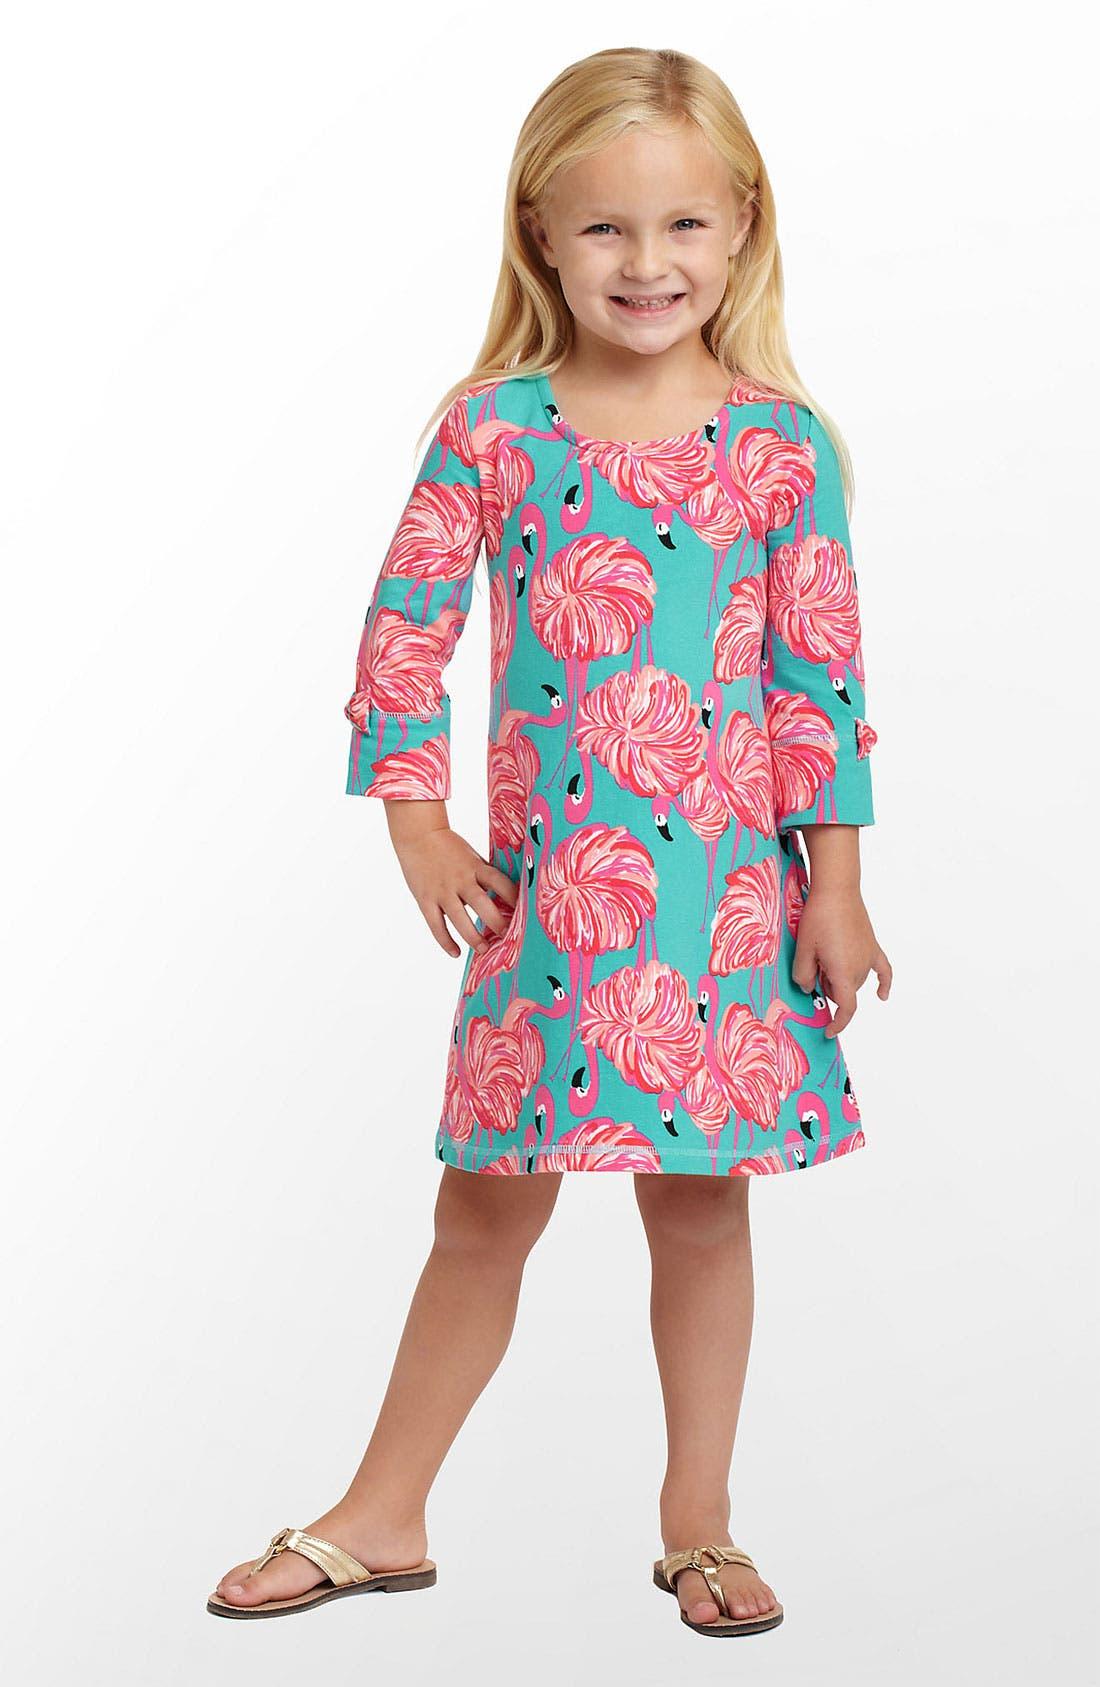 Alternate Image 1 Selected - Lilly Pulitzer® 'Primm' Knit Dress (Little Girls & Big Girls)